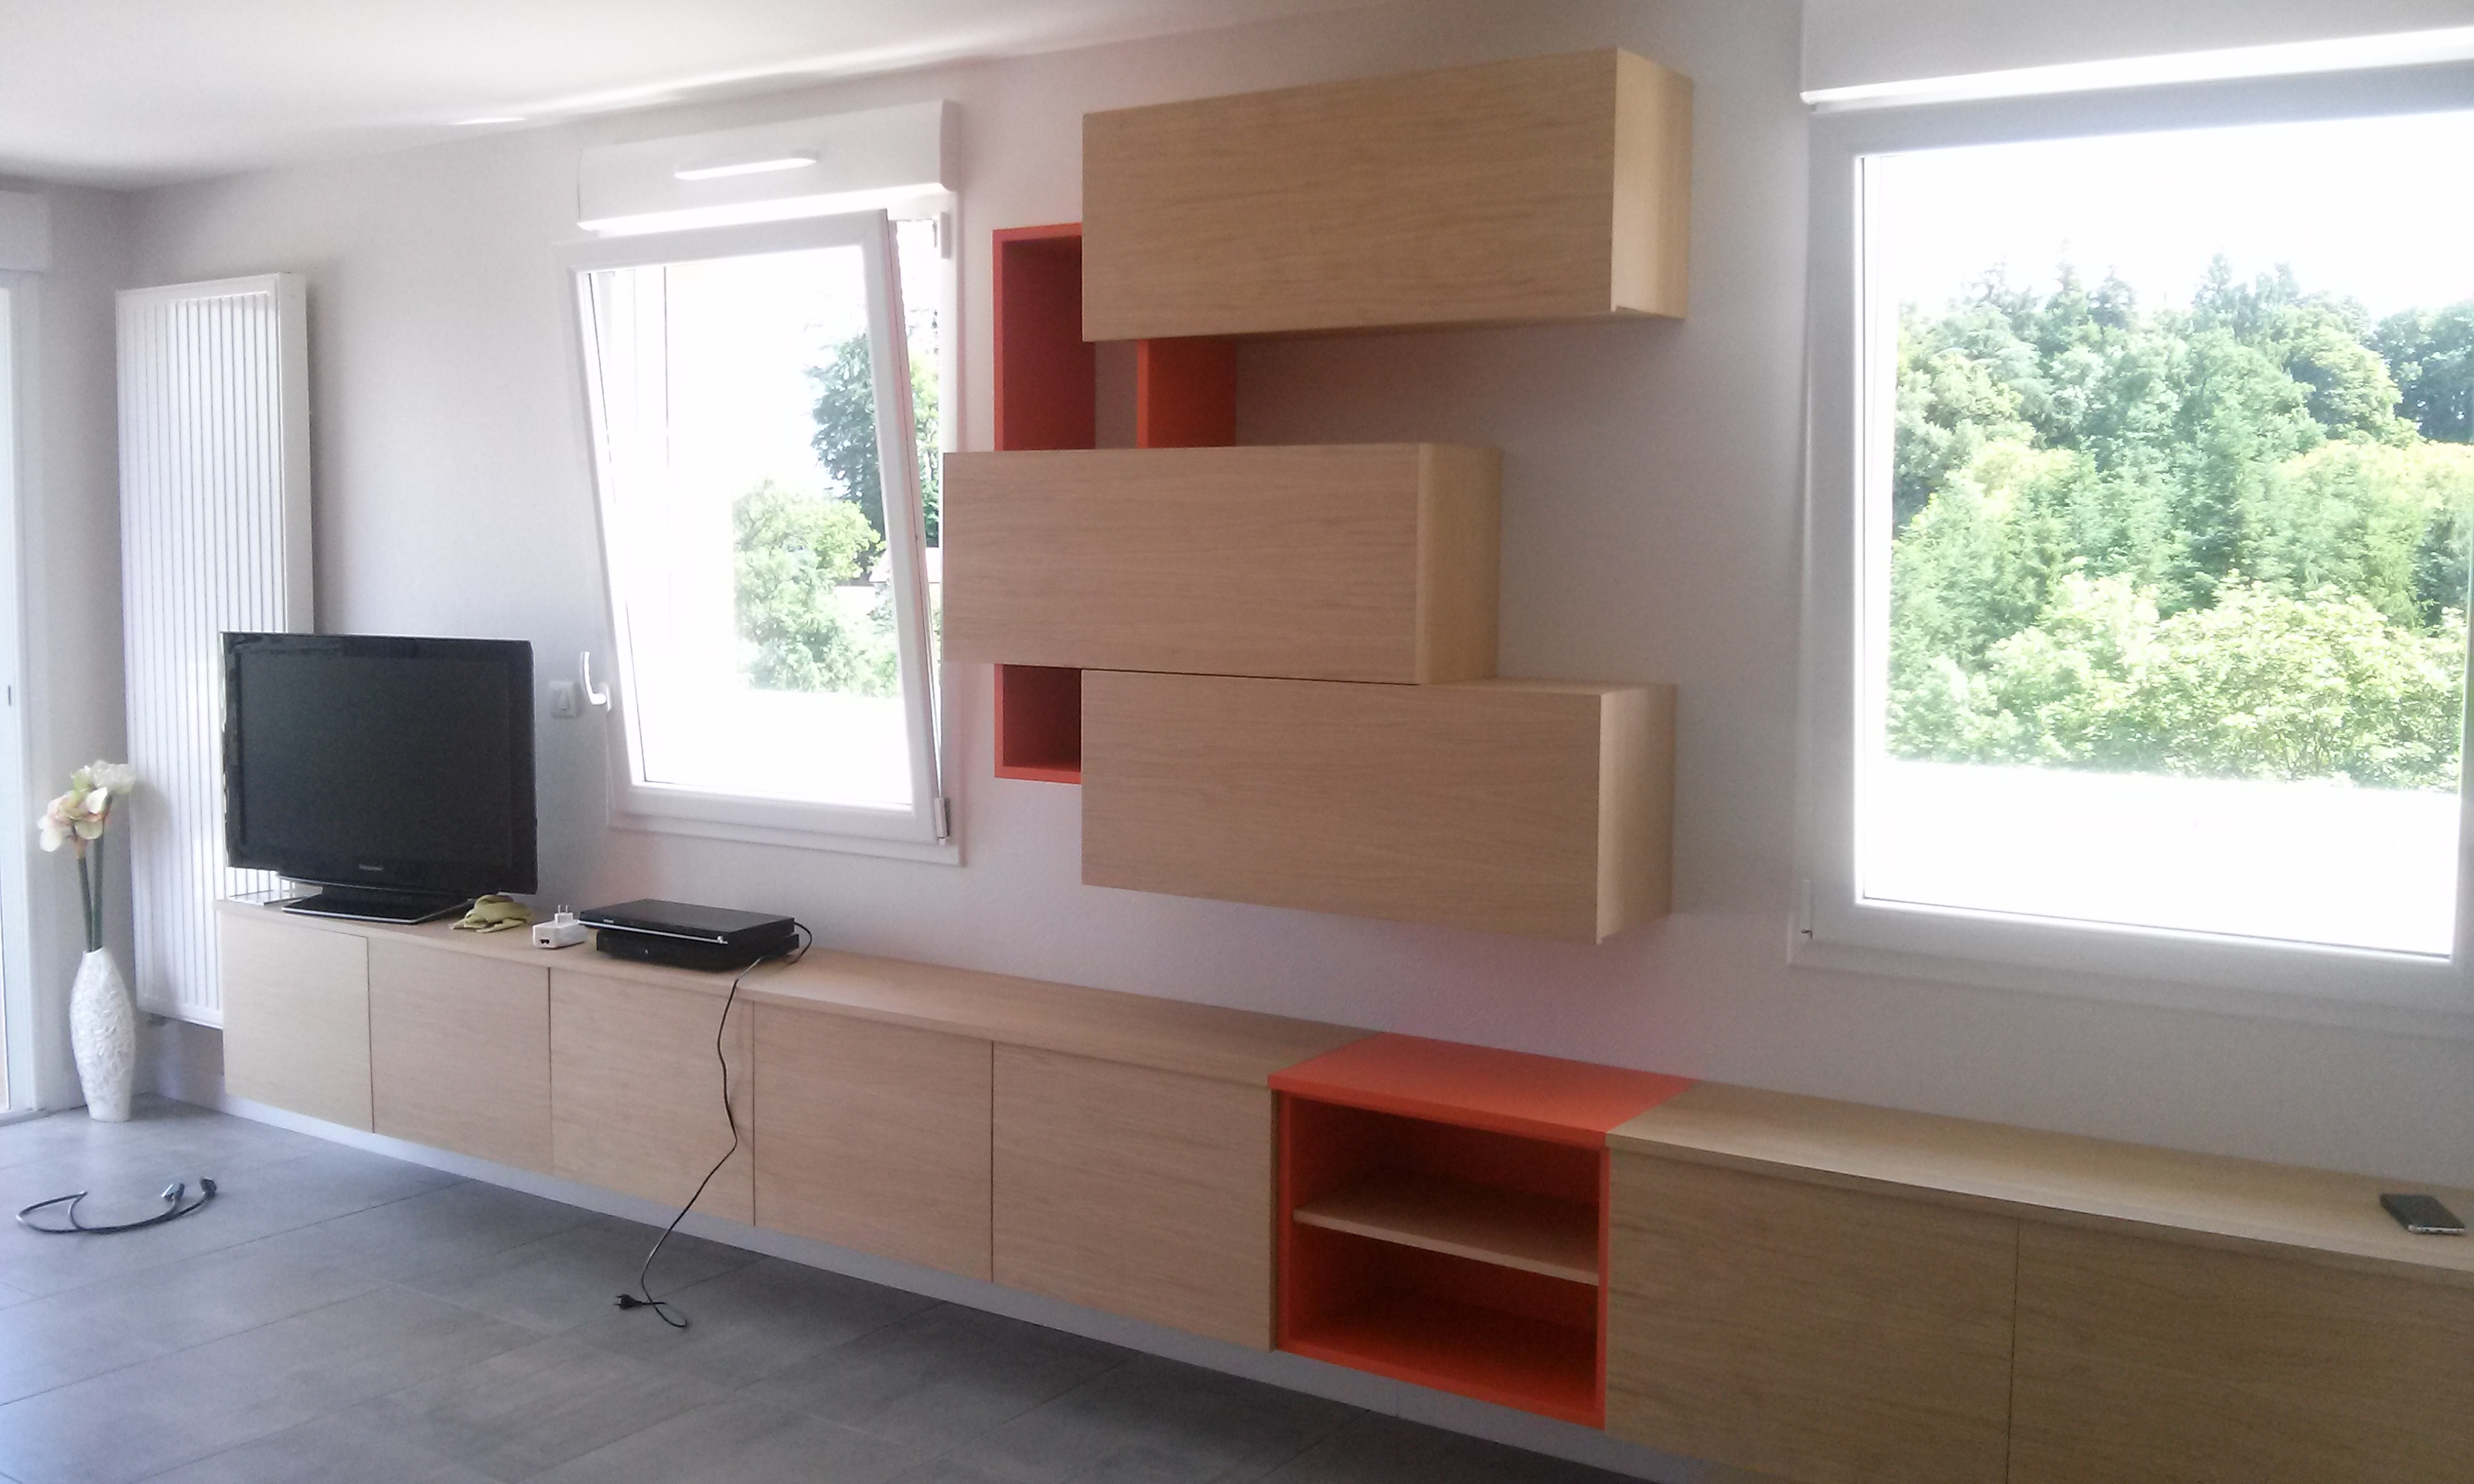 20170610 112834 meubles decroix. Black Bedroom Furniture Sets. Home Design Ideas